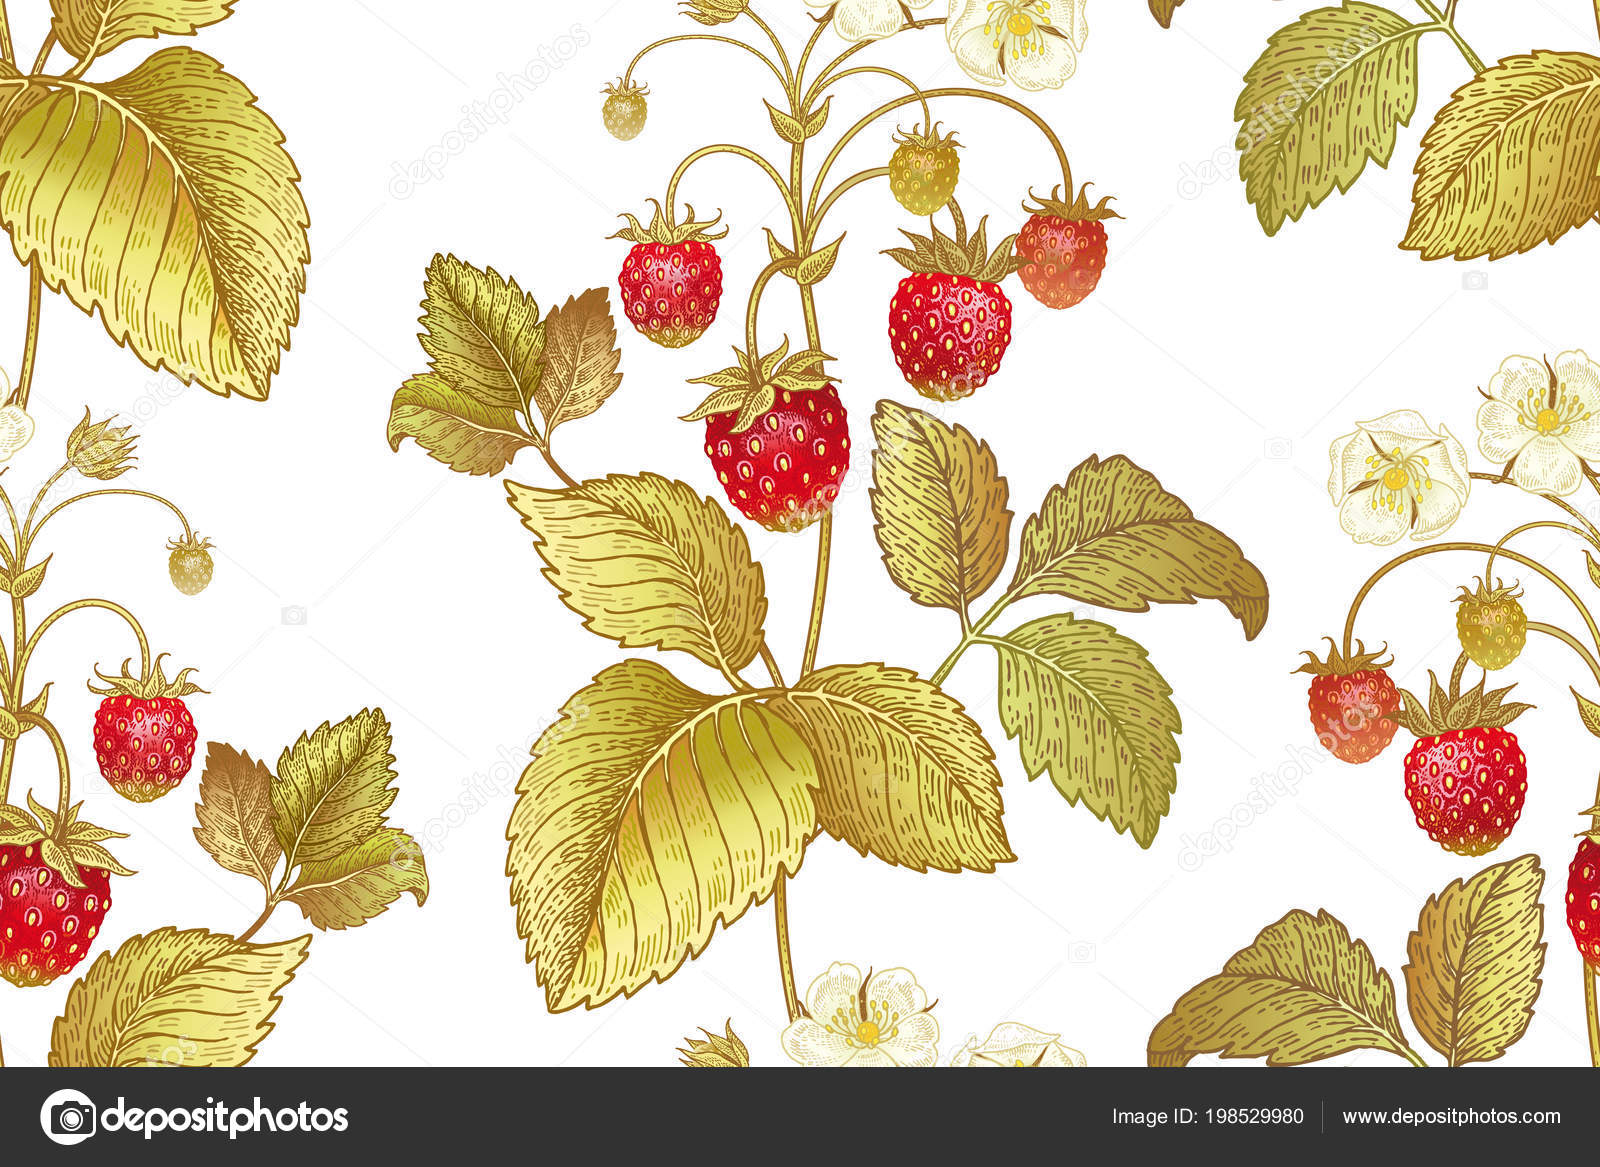 kitchen design template building a cabinet 与草莓的花朵和浆果的白色背景的无缝植物模式维多利亚风格矢量插图厨房 与草莓的花朵和浆果的白色背景的无缝植物模式 老式 维多利亚风格 矢量插图 厨房设计模板 食品 纸 纺织品包装 矢量图片sasha kasha